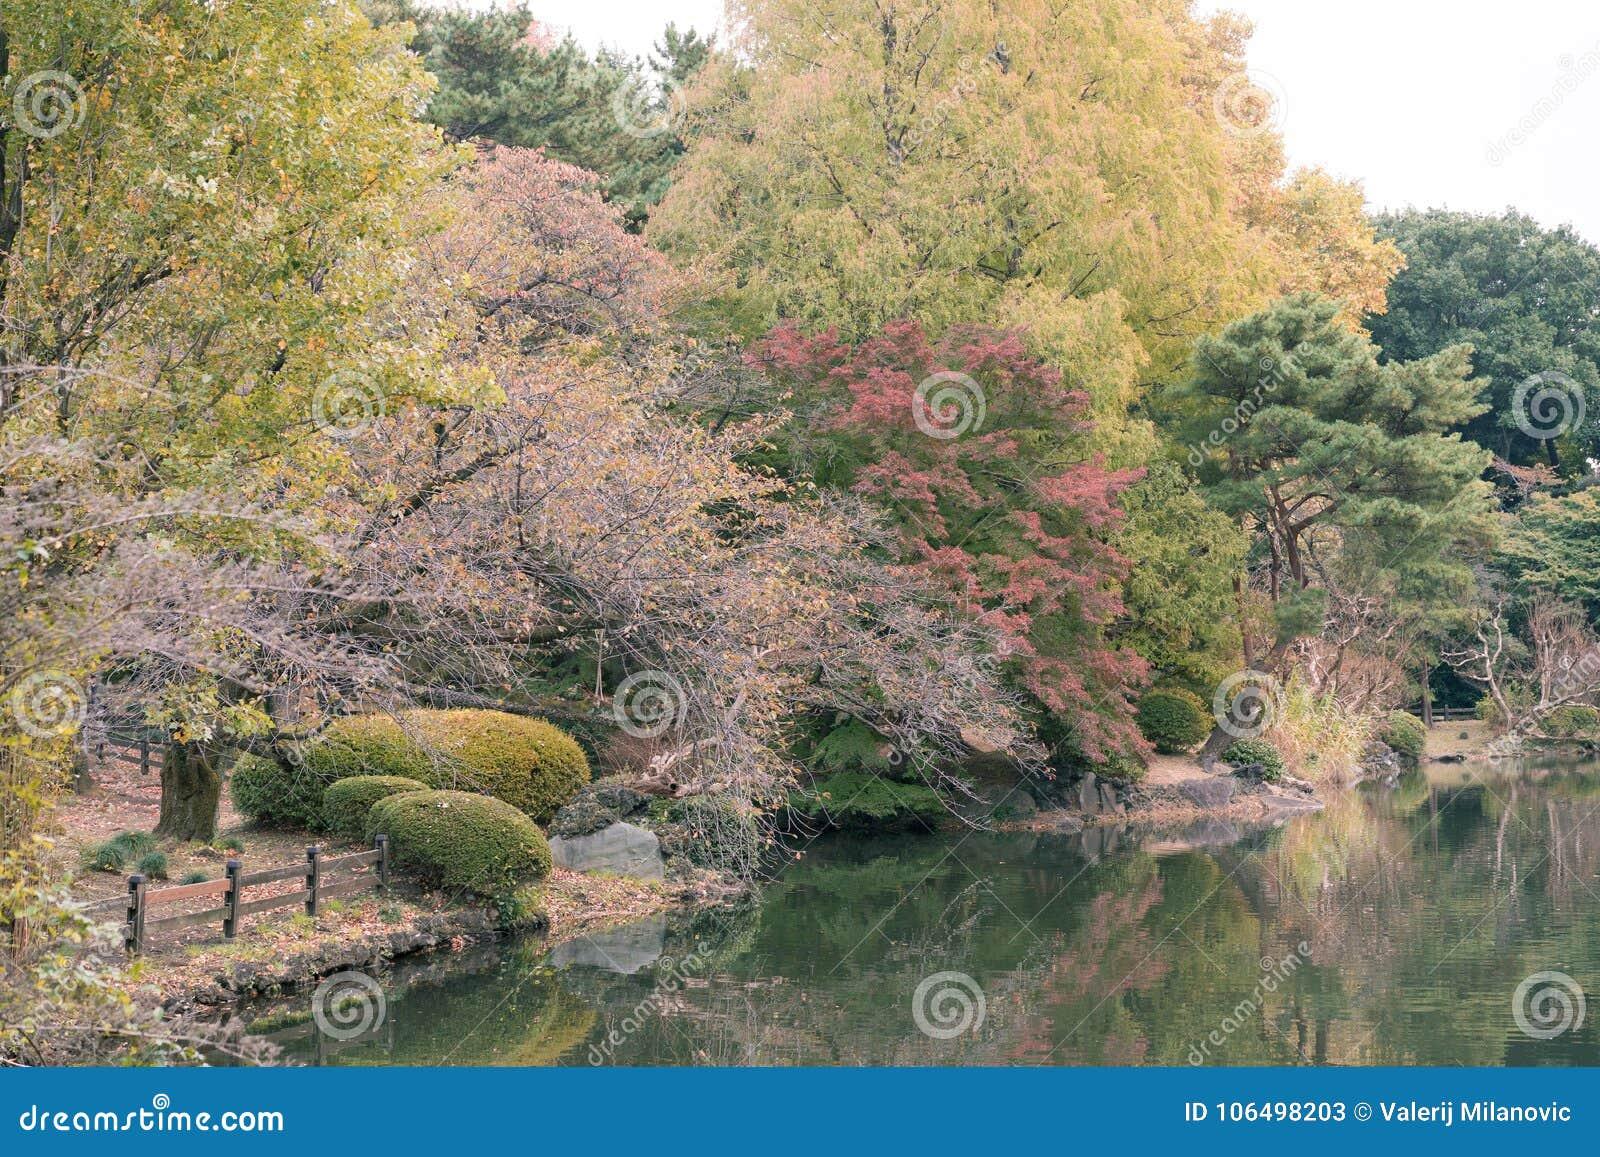 View of a lake and trees during autumn in Shinjuku Gyoen National Garden, Tokyo, Japan.